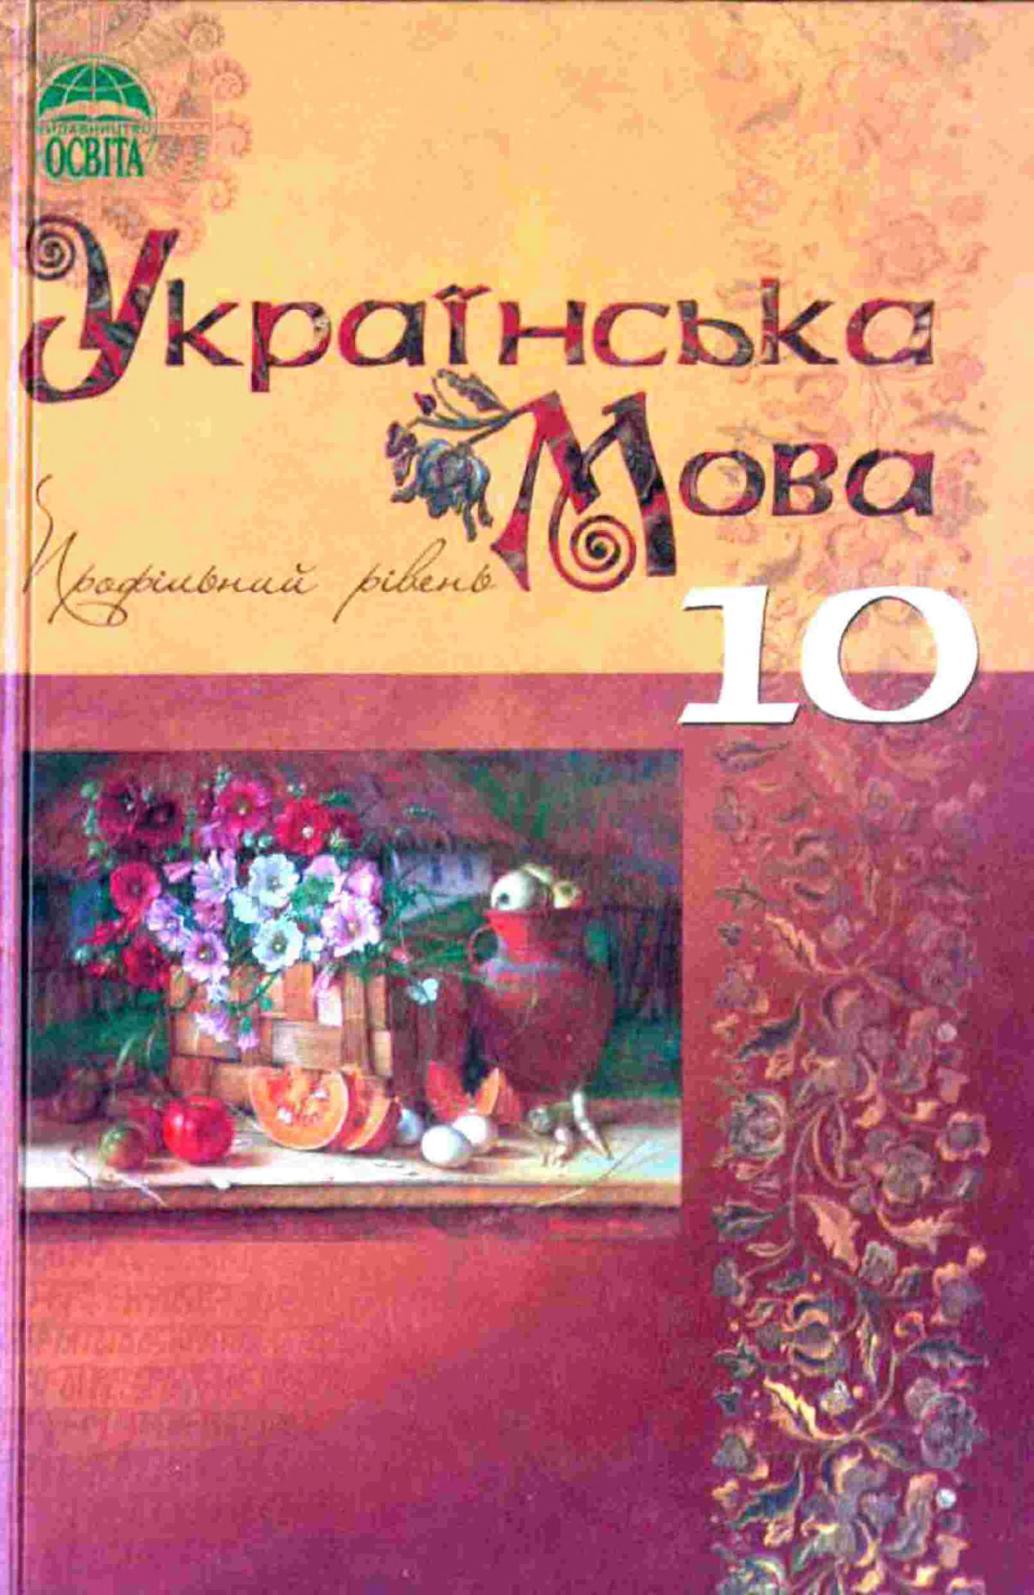 Calaméo - 10 класс. Украинский язык Pljushh 2010 6ce6d56b79cf1